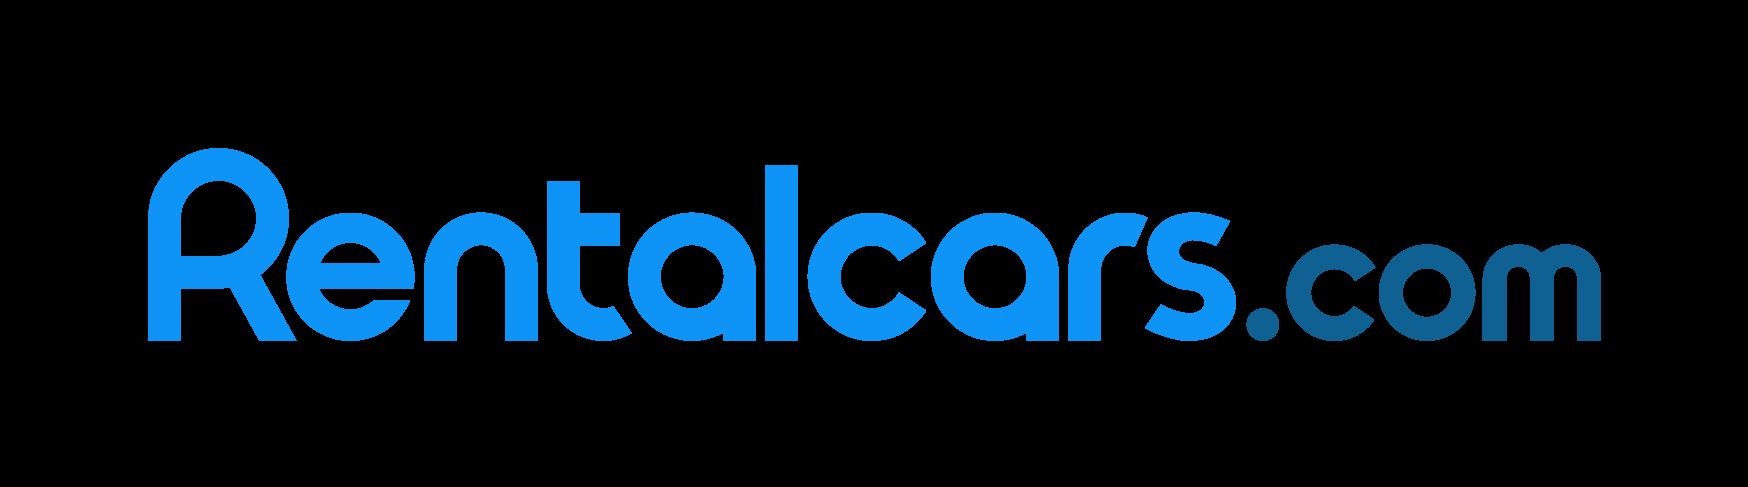 Alugar carro - Rentalcars.com